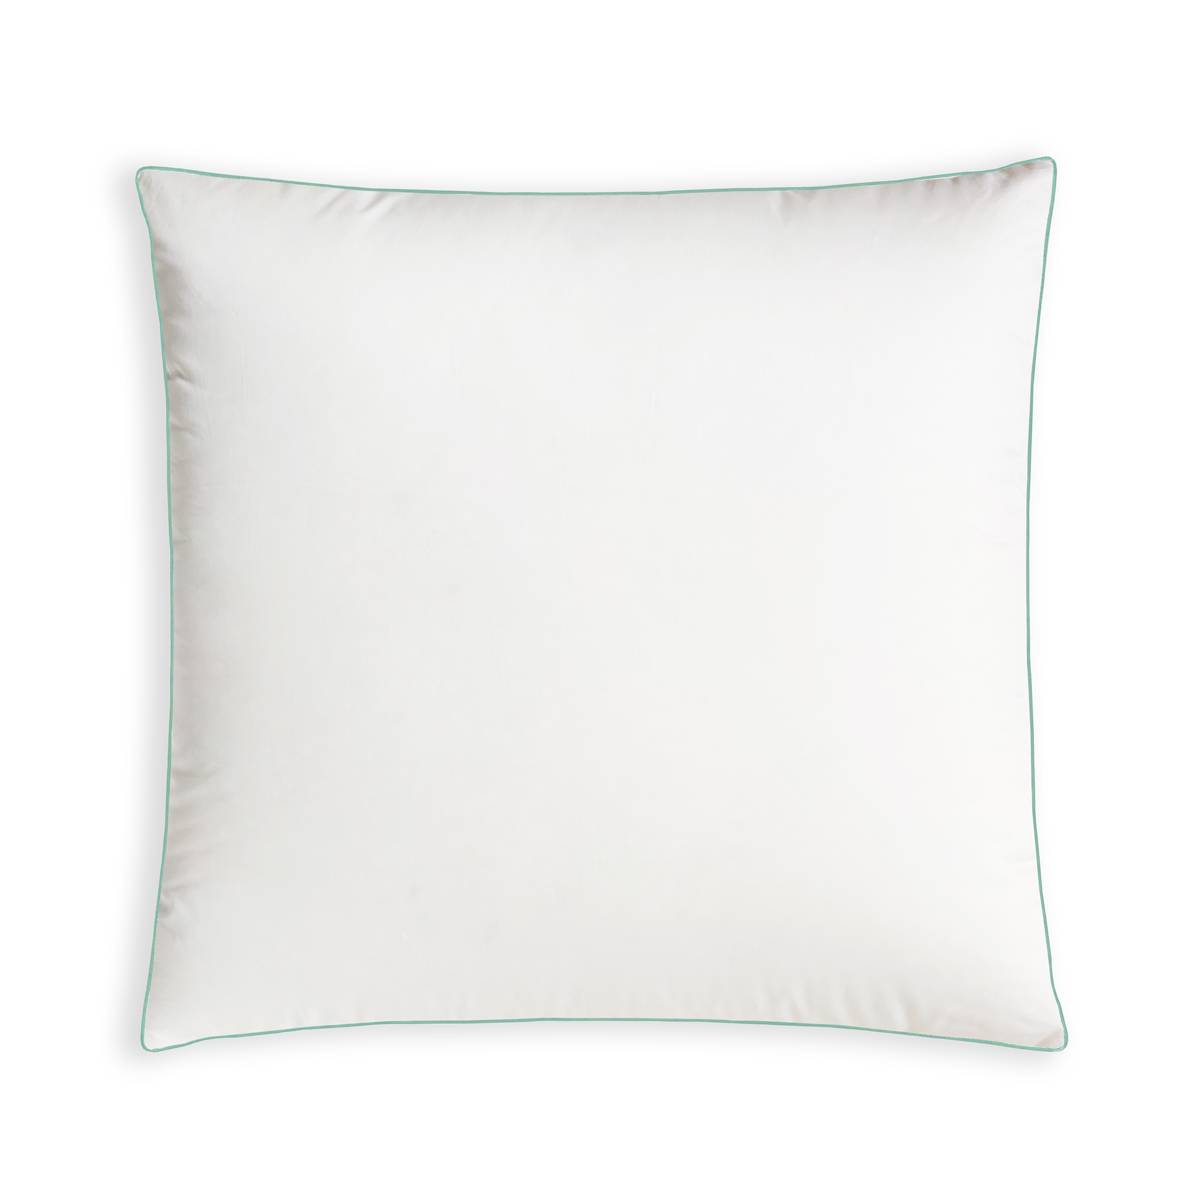 WAKE ME GREEN Oreiller MOELLEUX Gonflant Durable - Coton Bio  50x70 cm